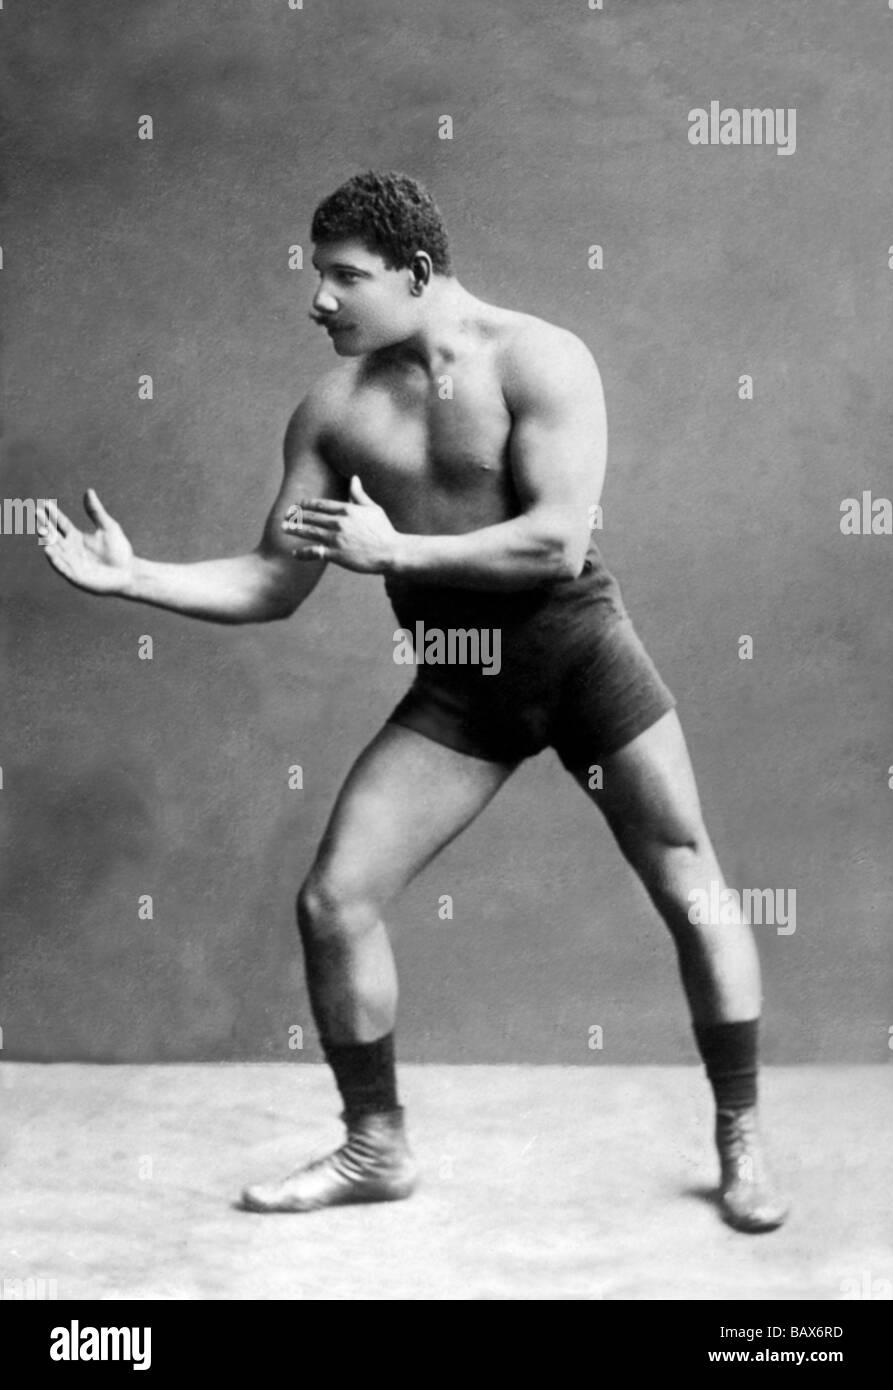 wrestling-ready-stance-BAX6RD.jpg